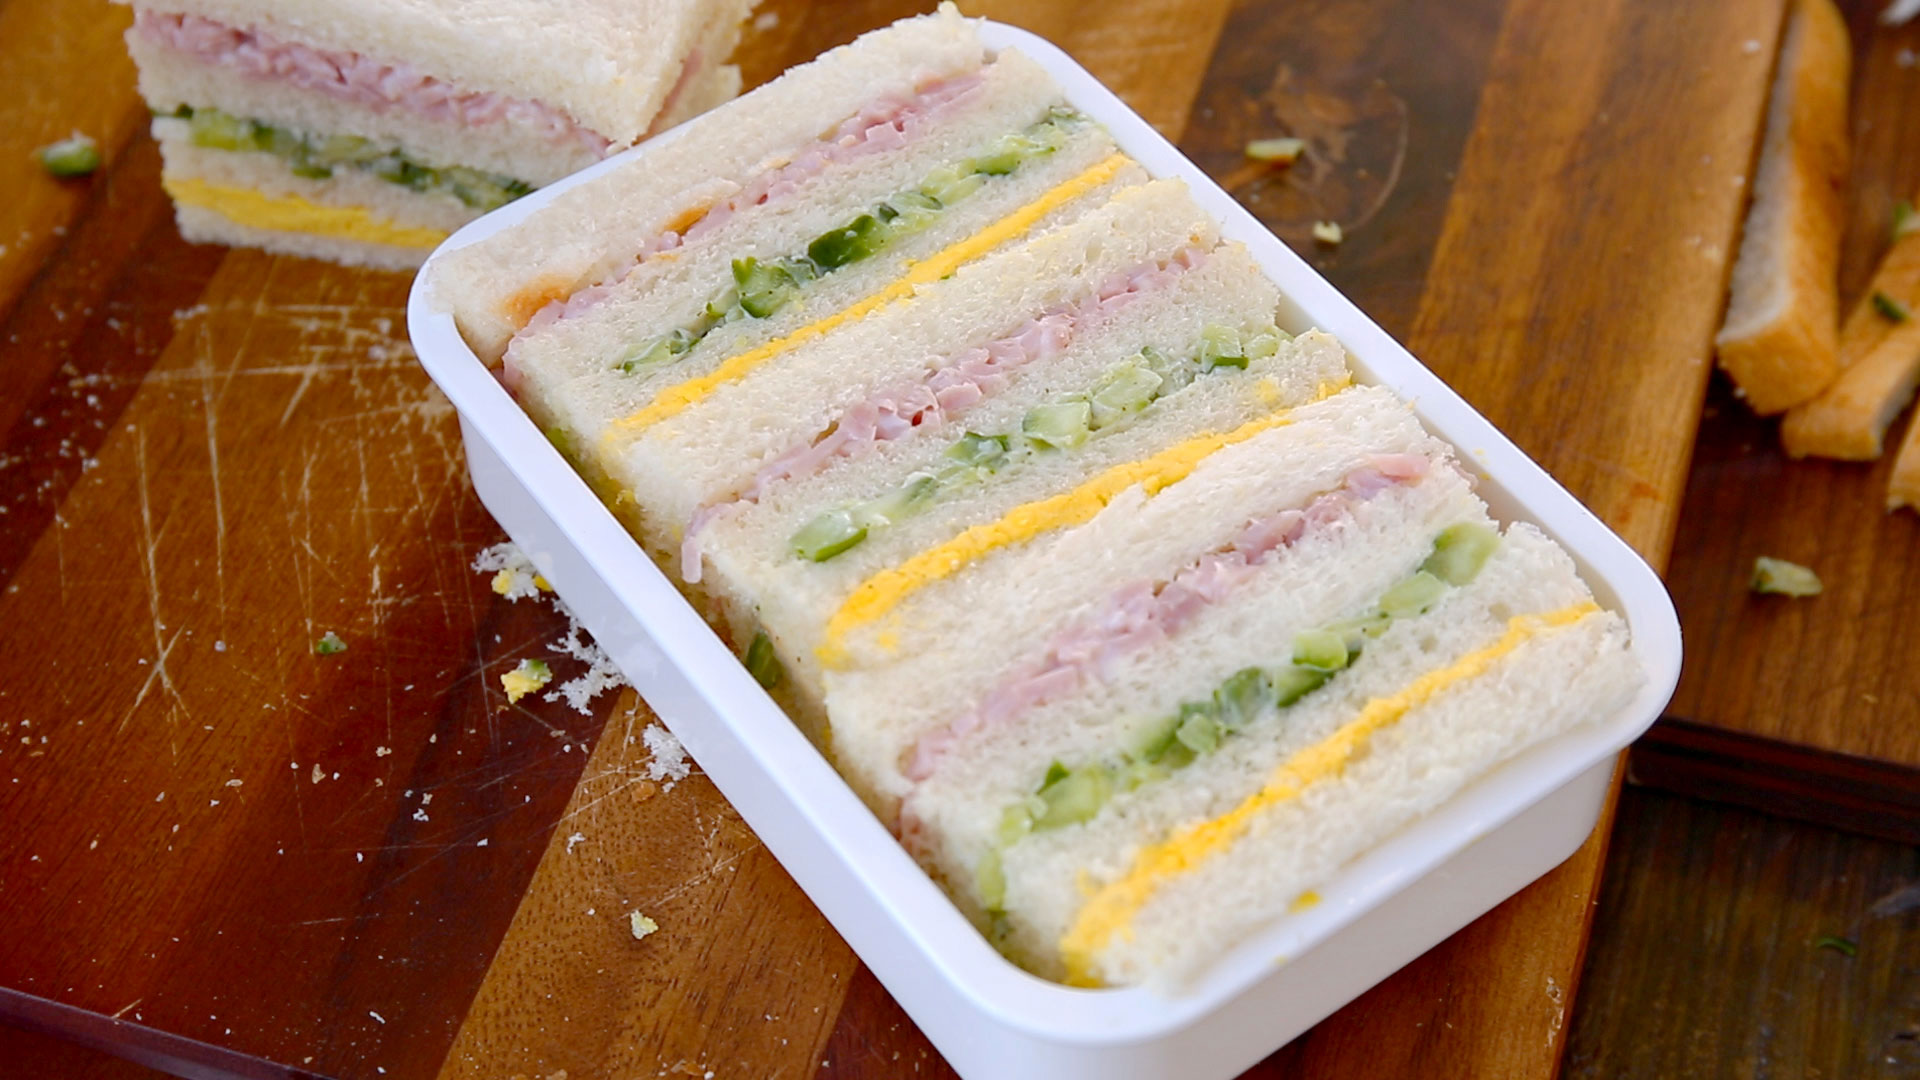 Three Color Sandwich Samsaek Sandwich Recipe